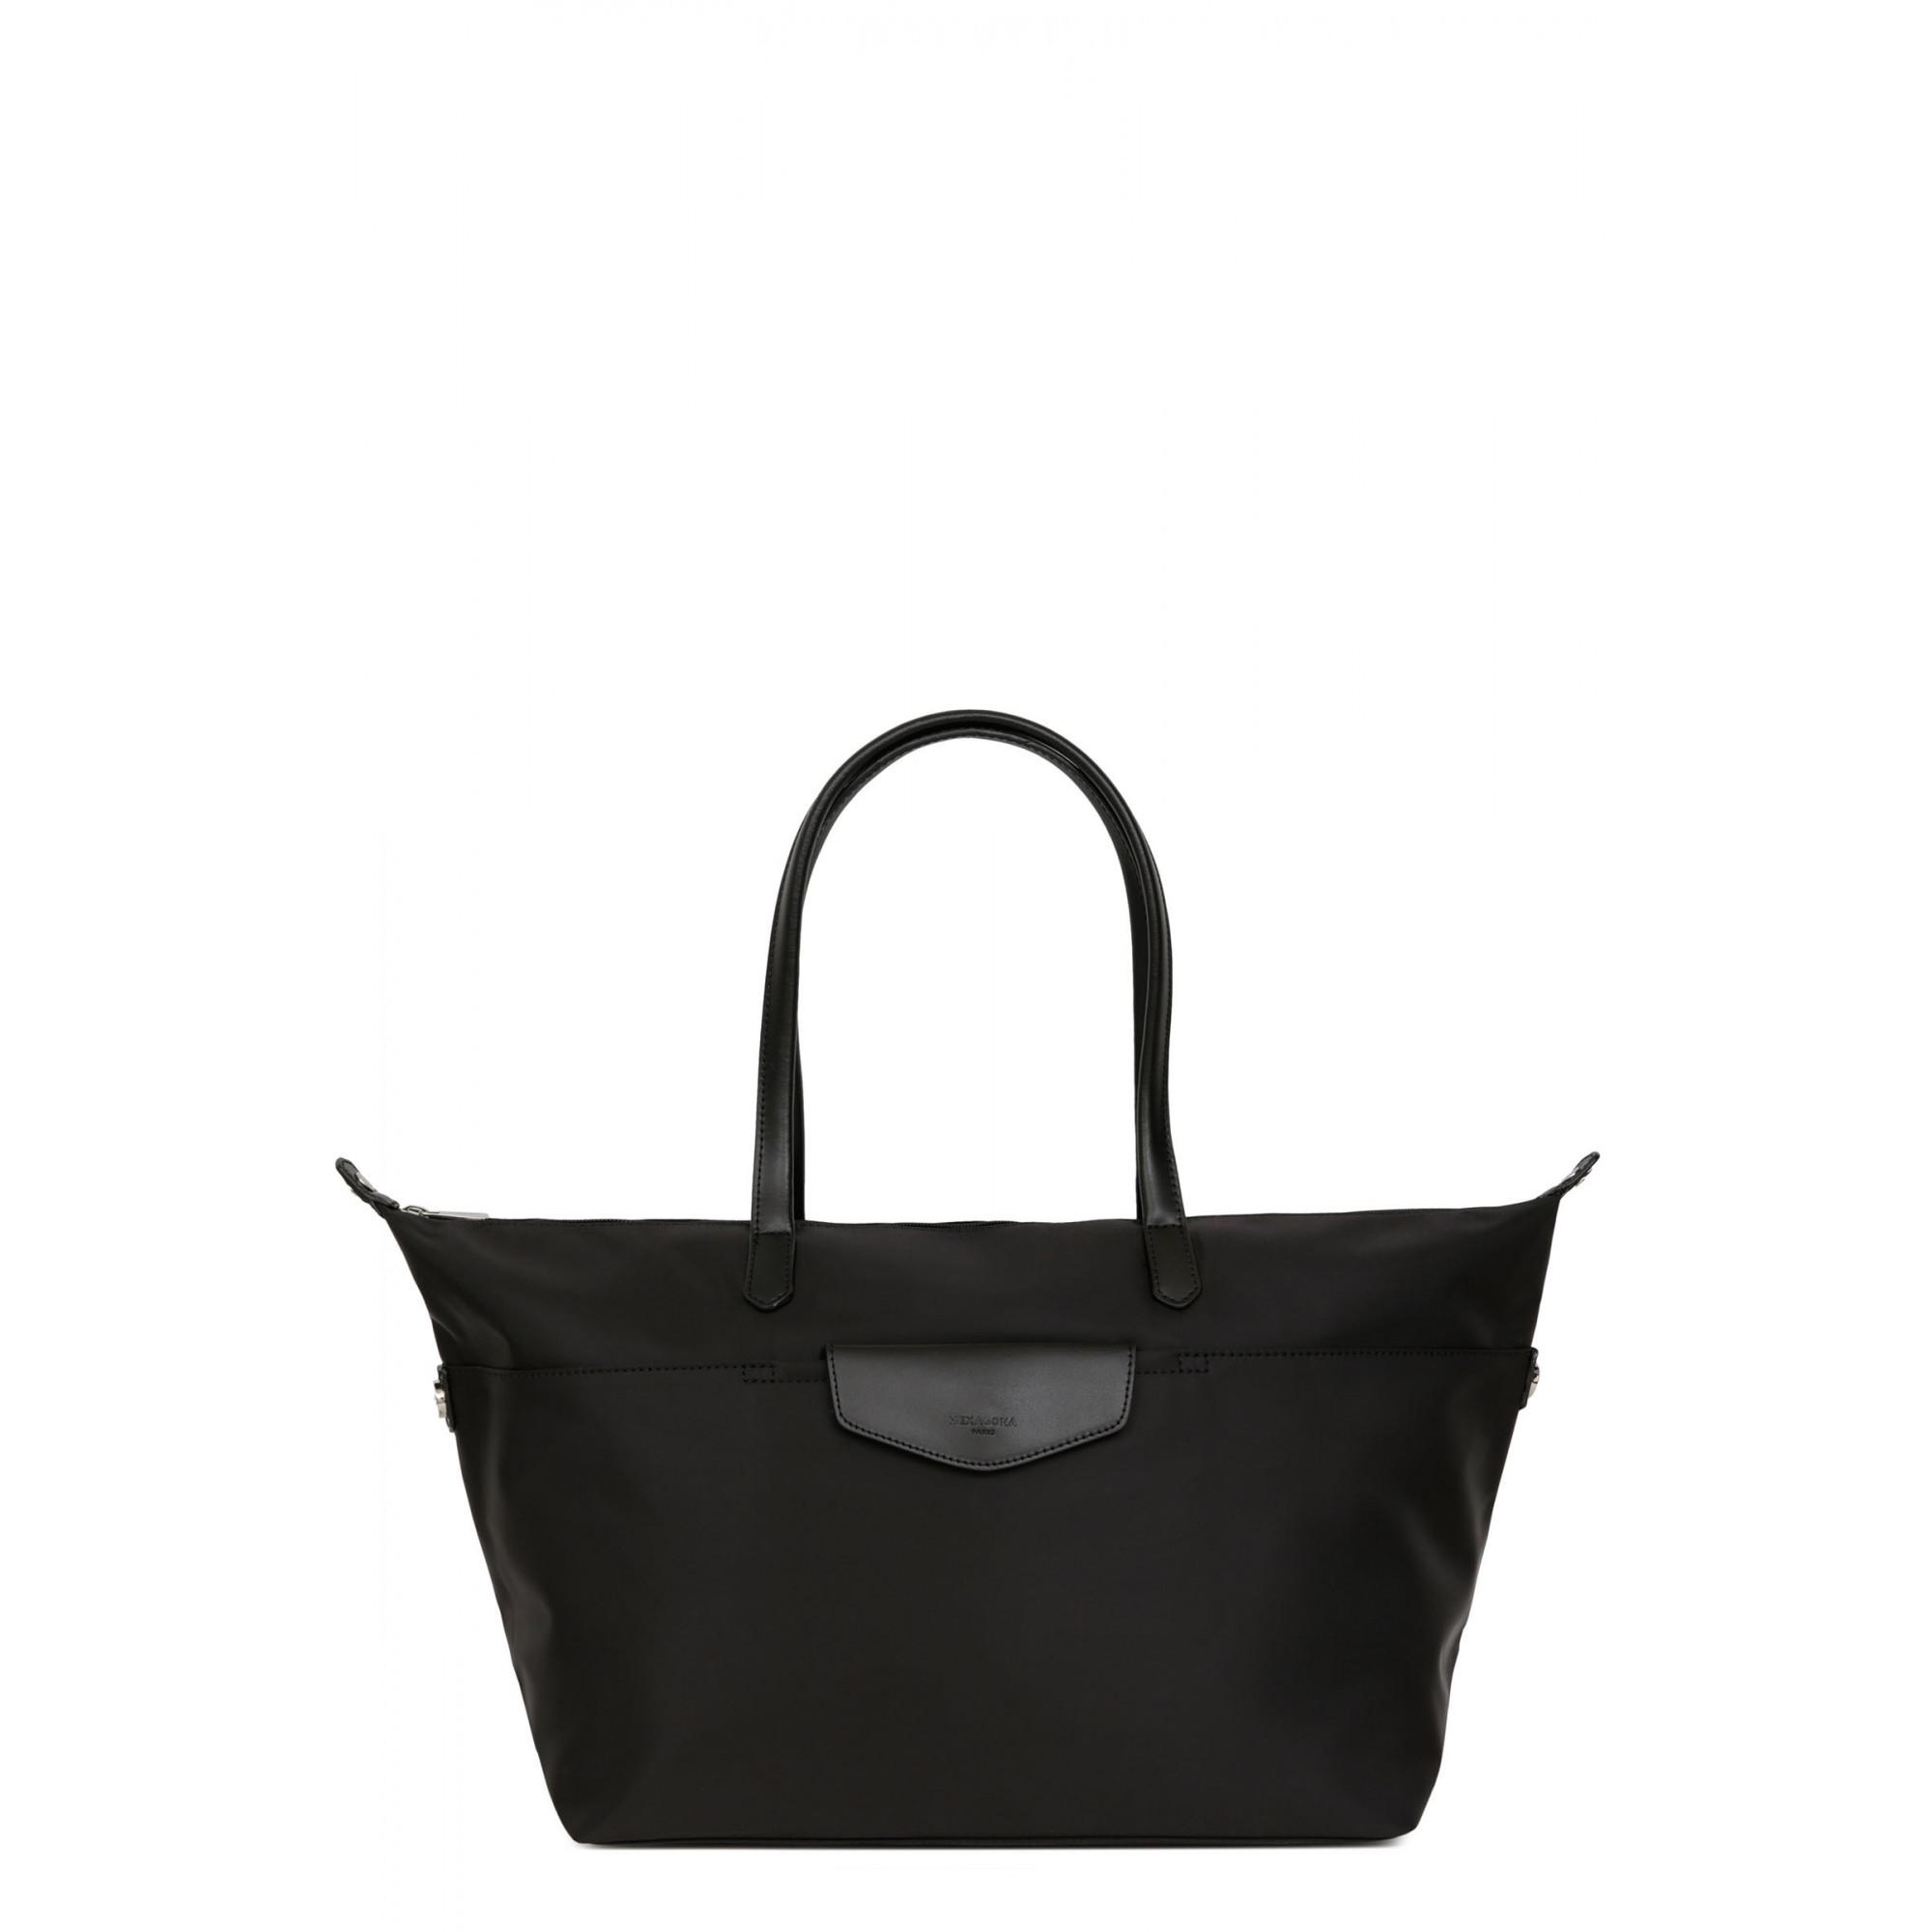 Travel Bag Black - HEXAGONA